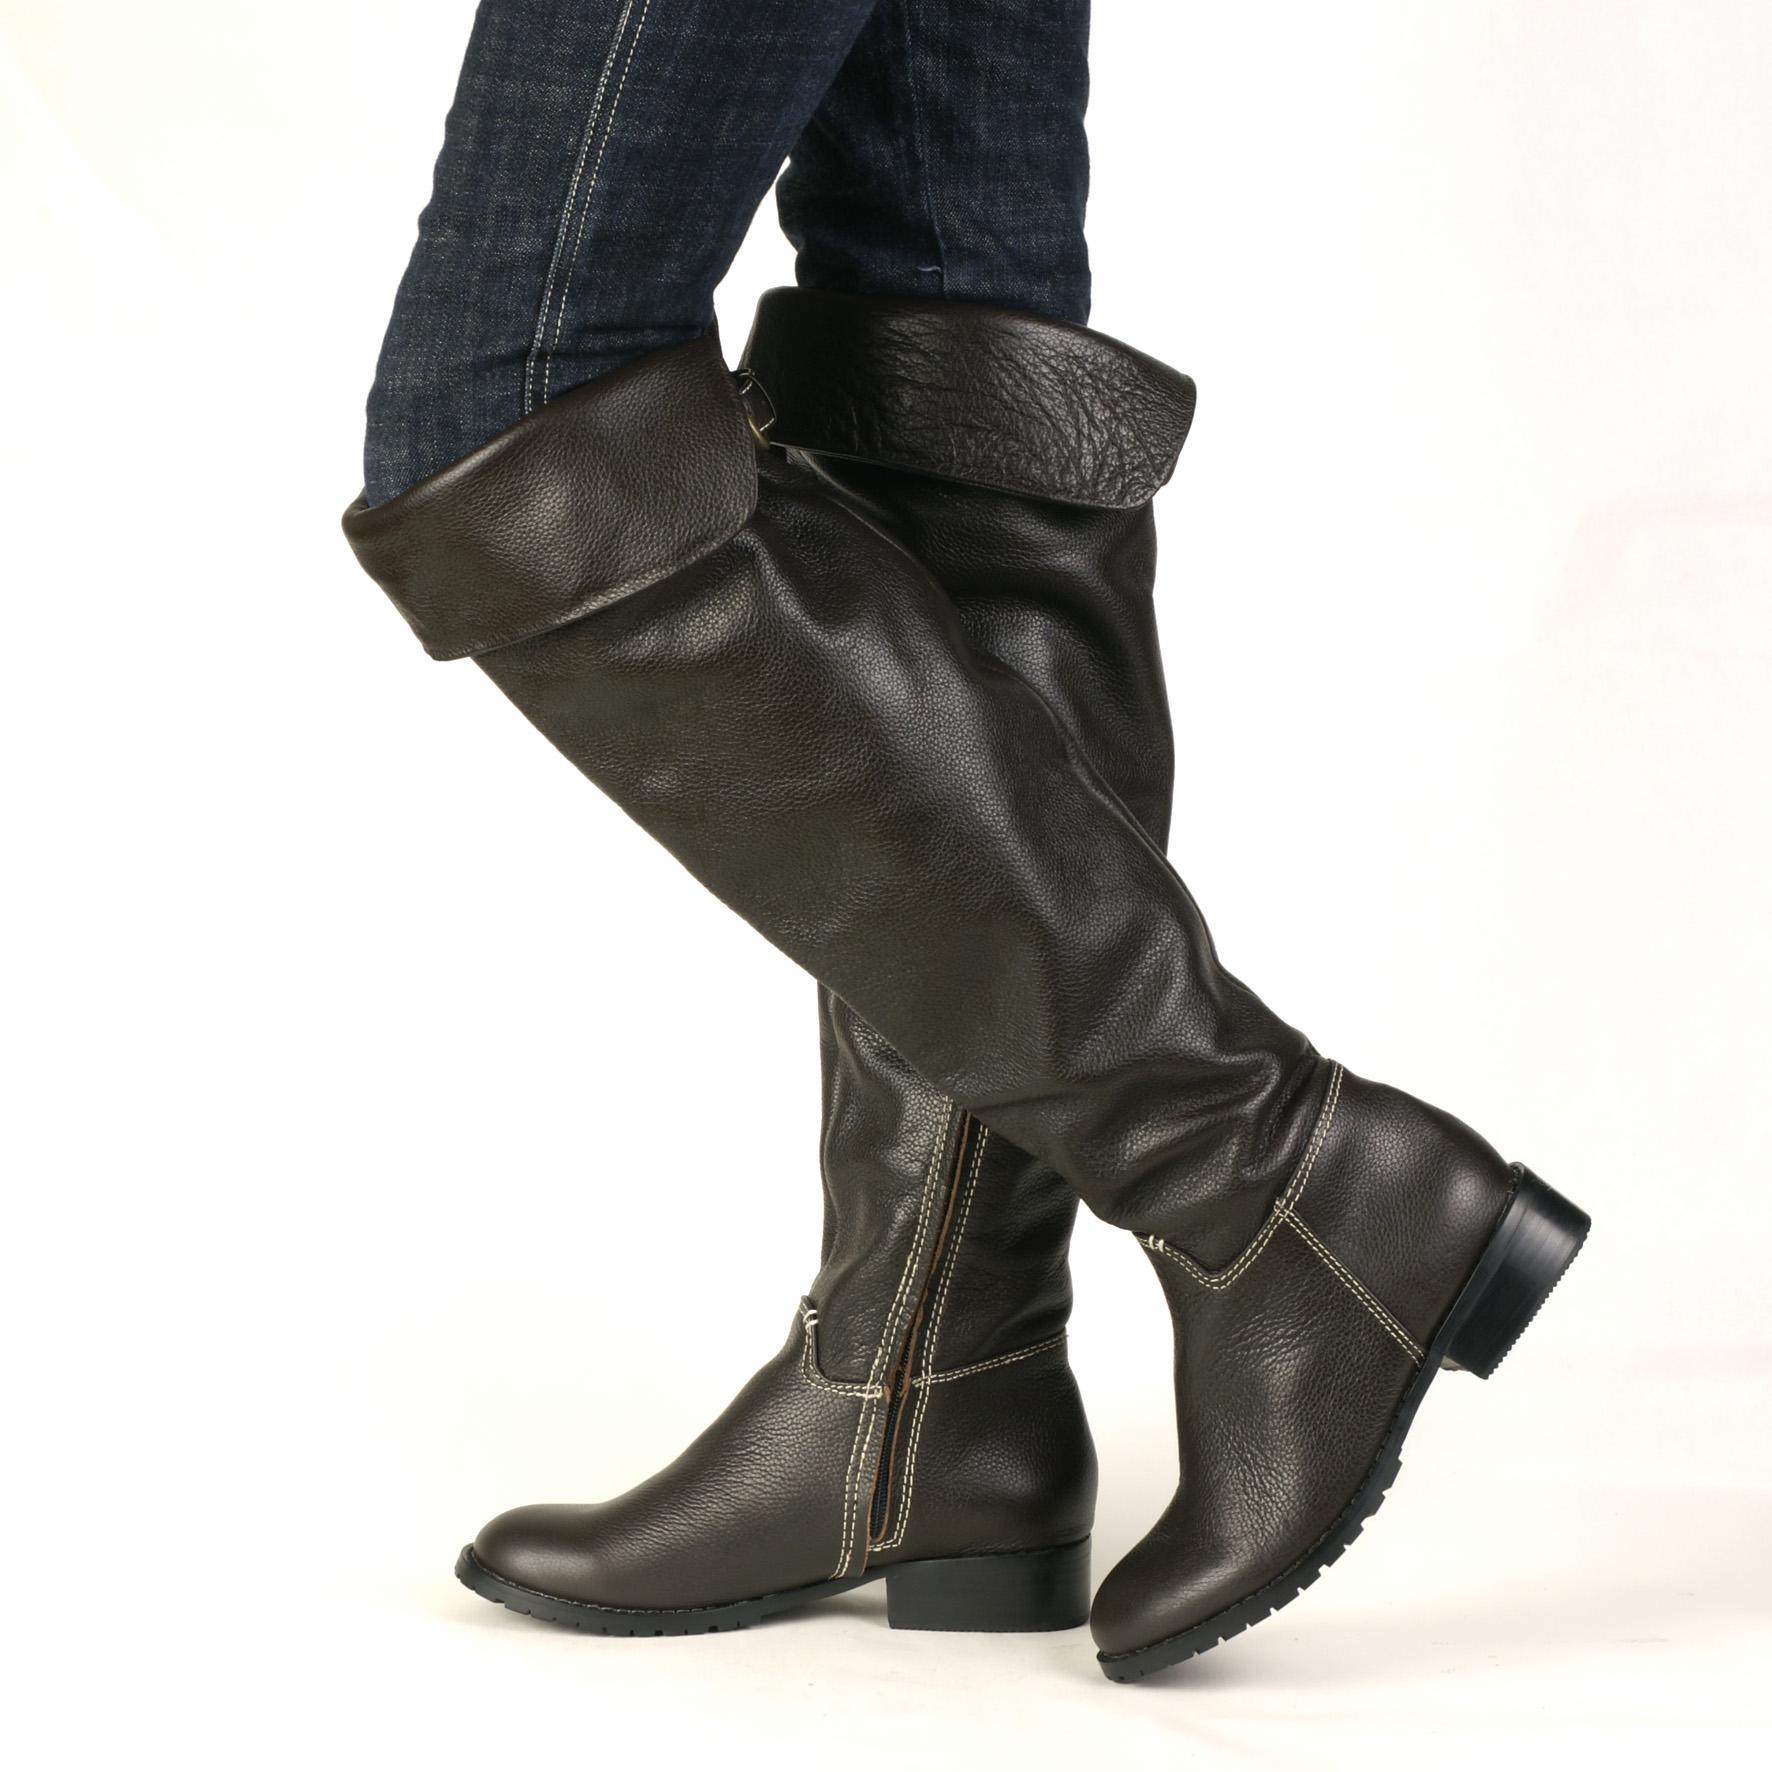 Produktbilleder Støvler